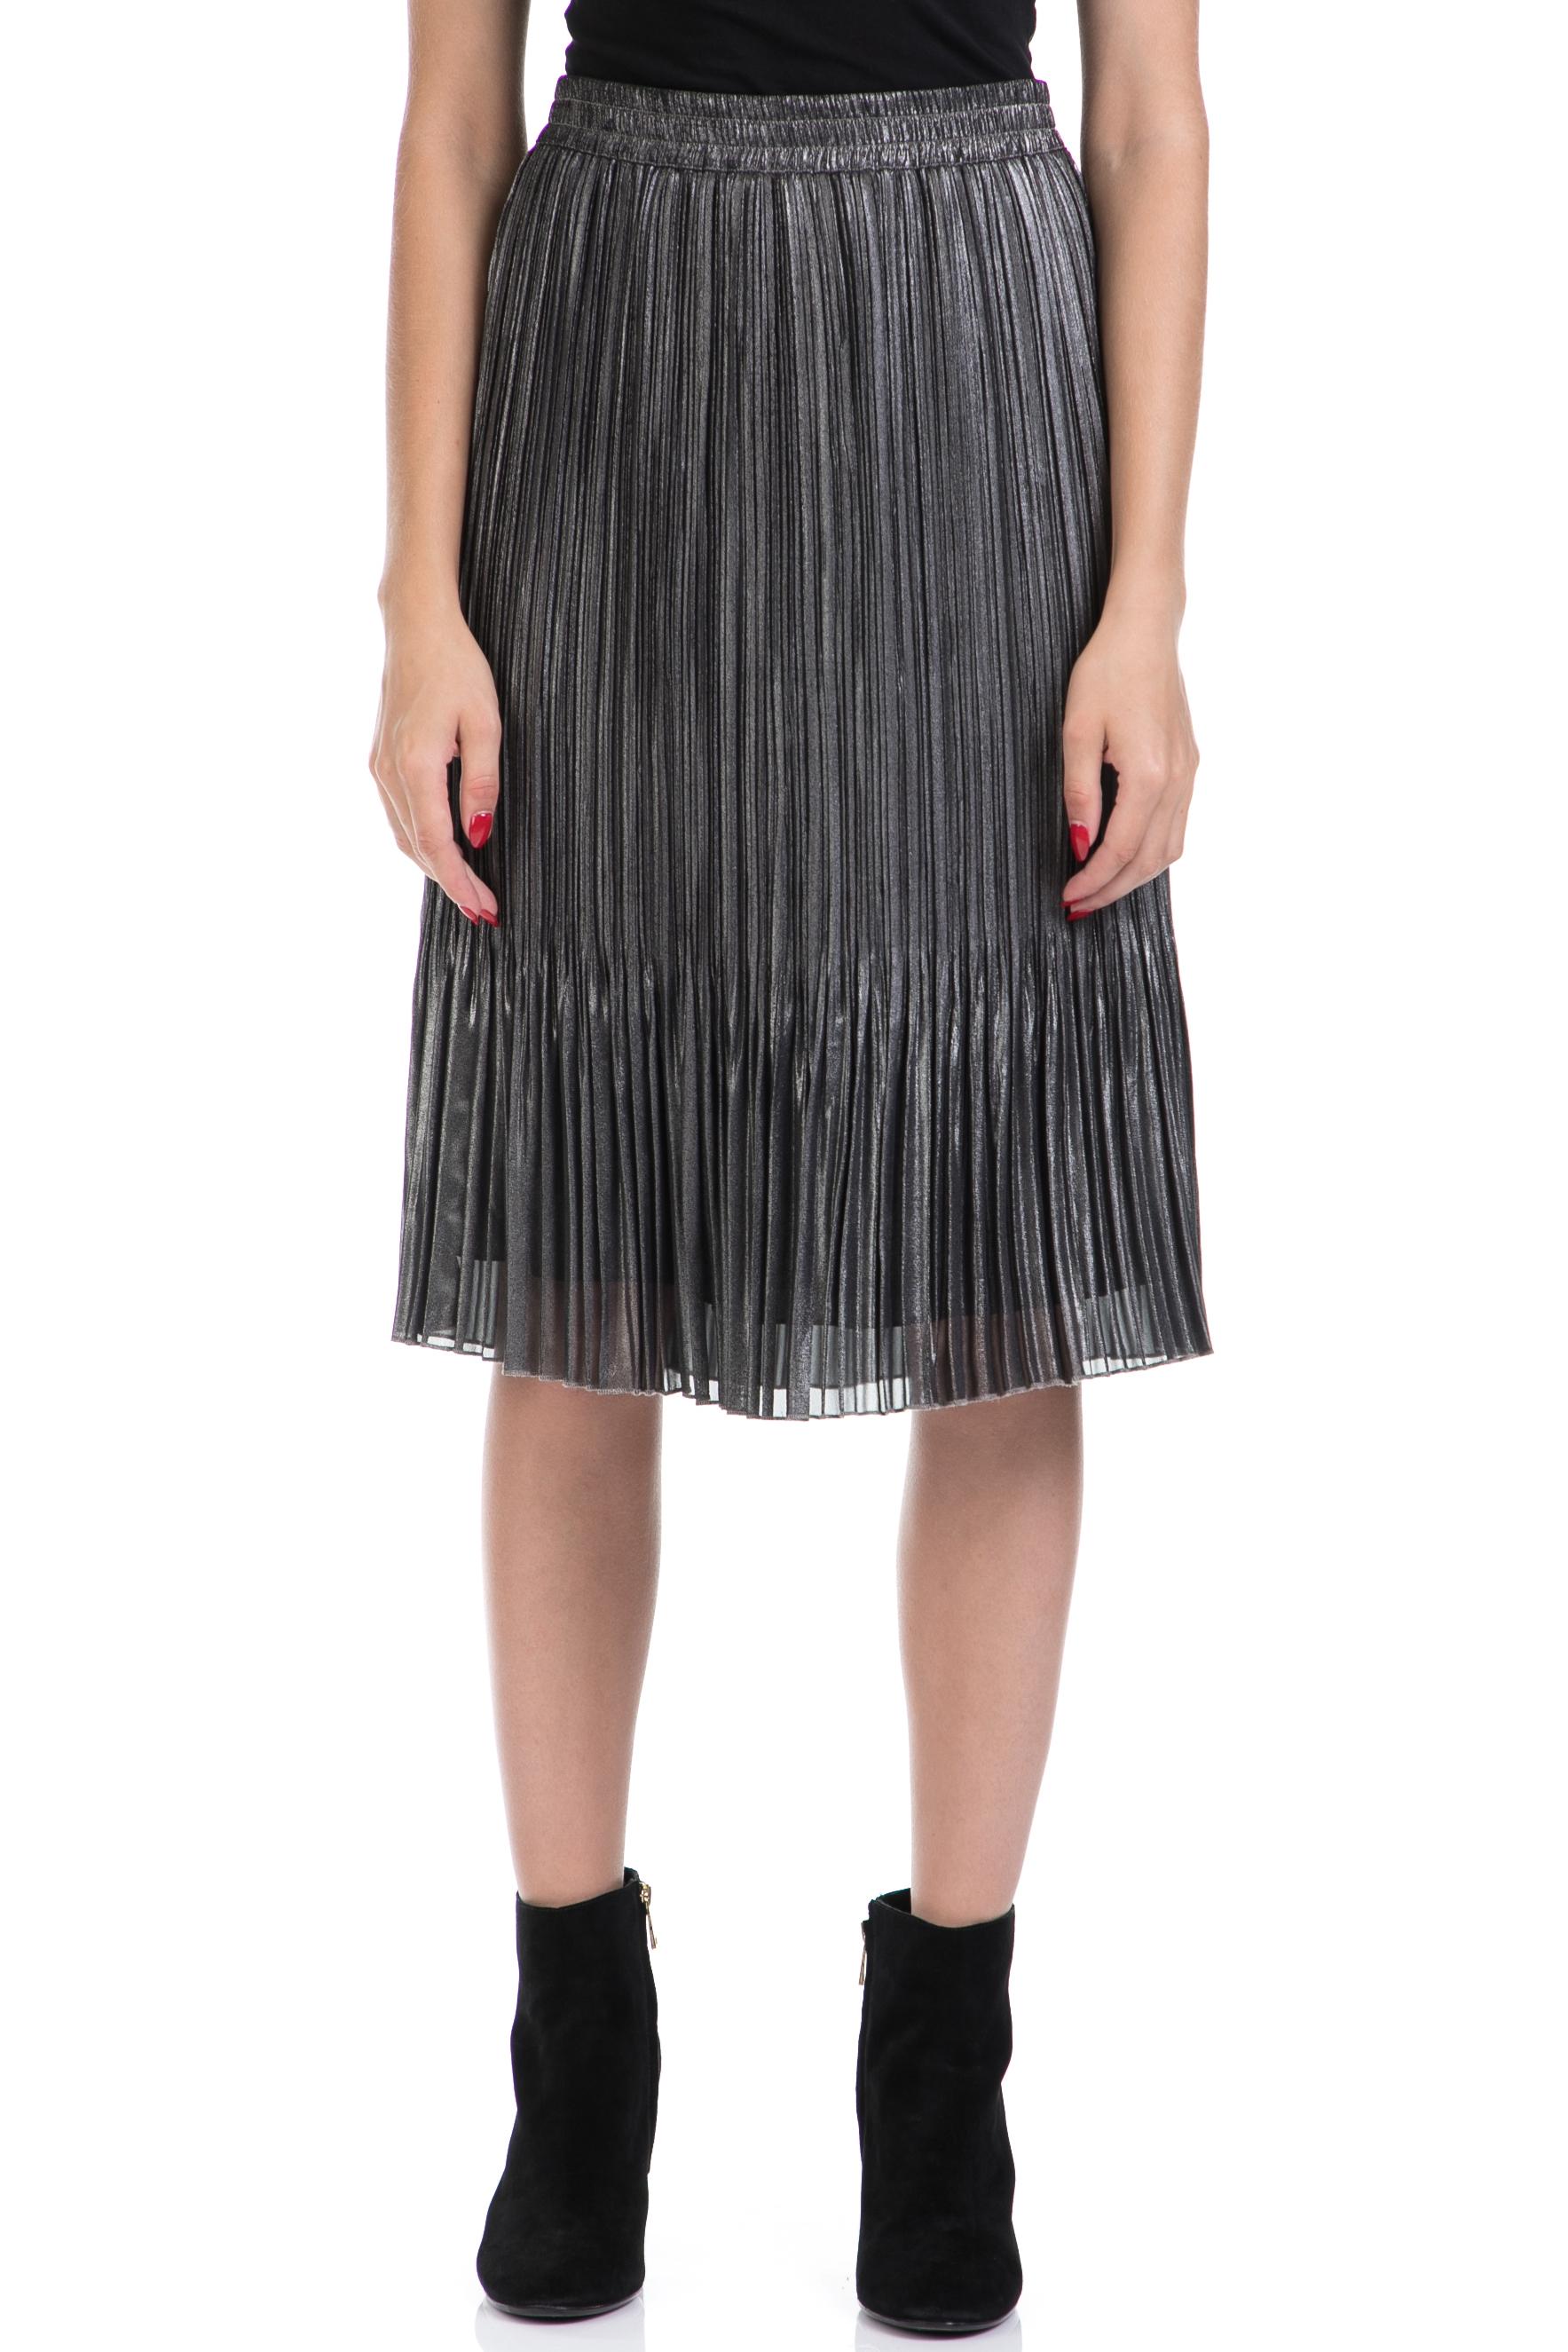 SCOTCH & SODA – Γυναικεία φούστα MAISON SCOTCH ασημί